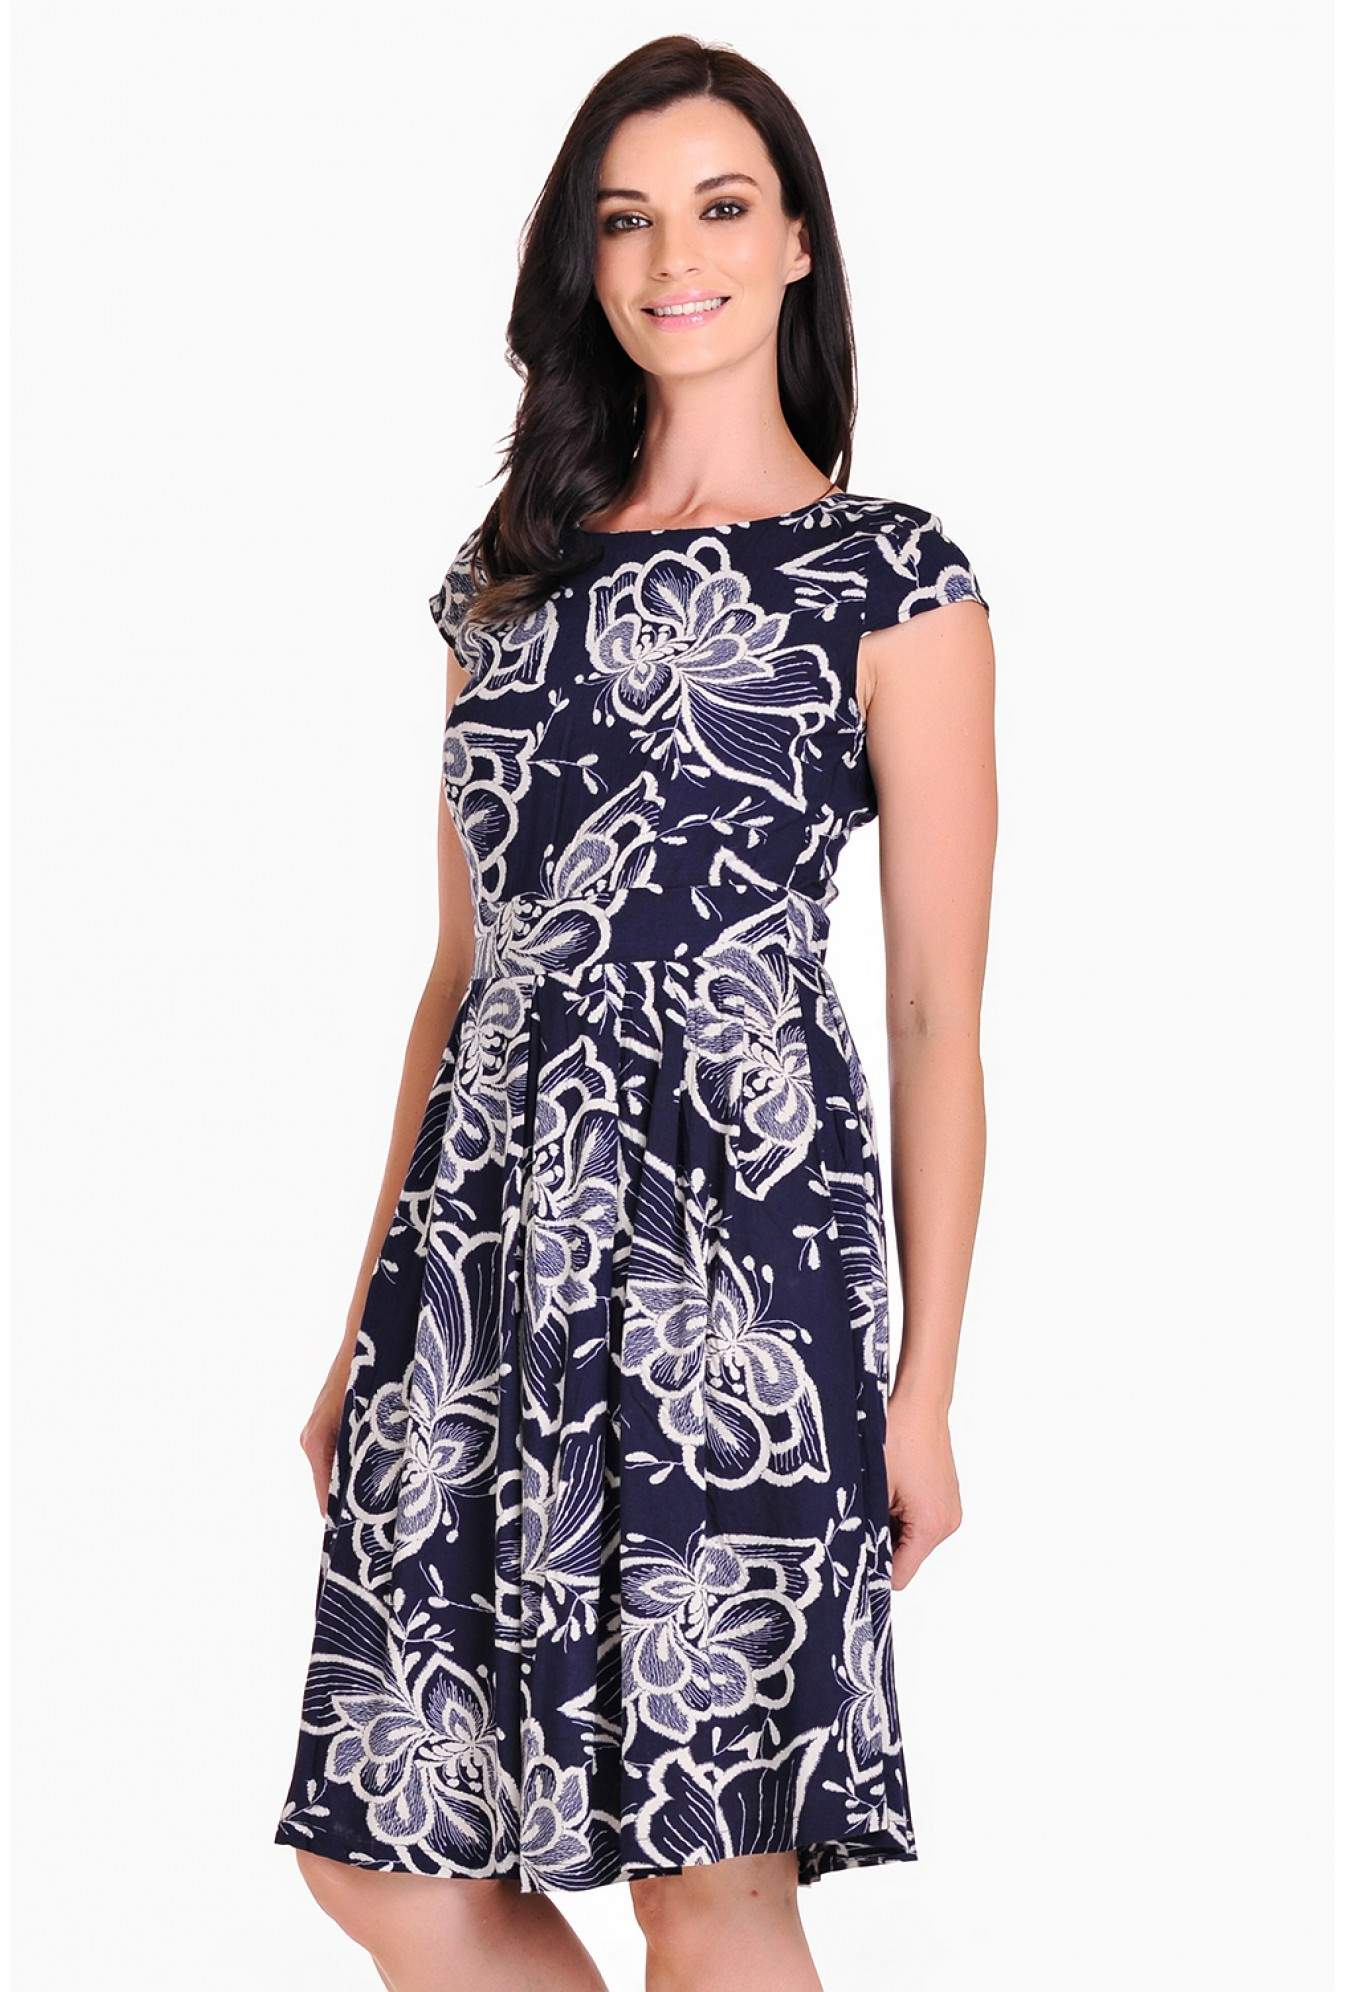 77388a4b0a7df Stella Paloma Flower Print Midi Dress | iCLOTHING